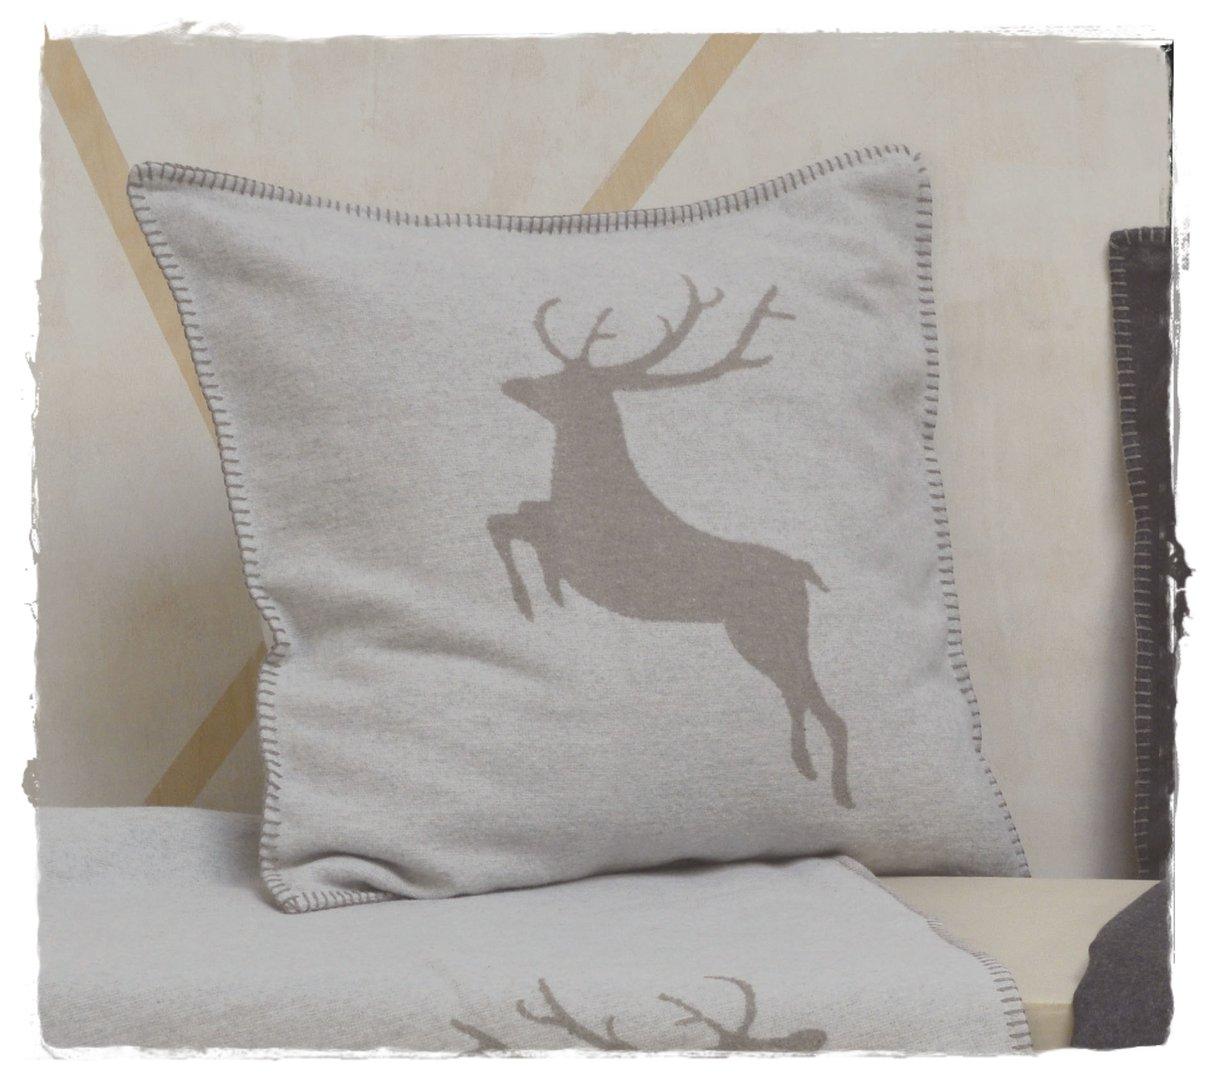 hirsch filz kissen kissenh lle sylt 50x50cm david fussenegger. Black Bedroom Furniture Sets. Home Design Ideas